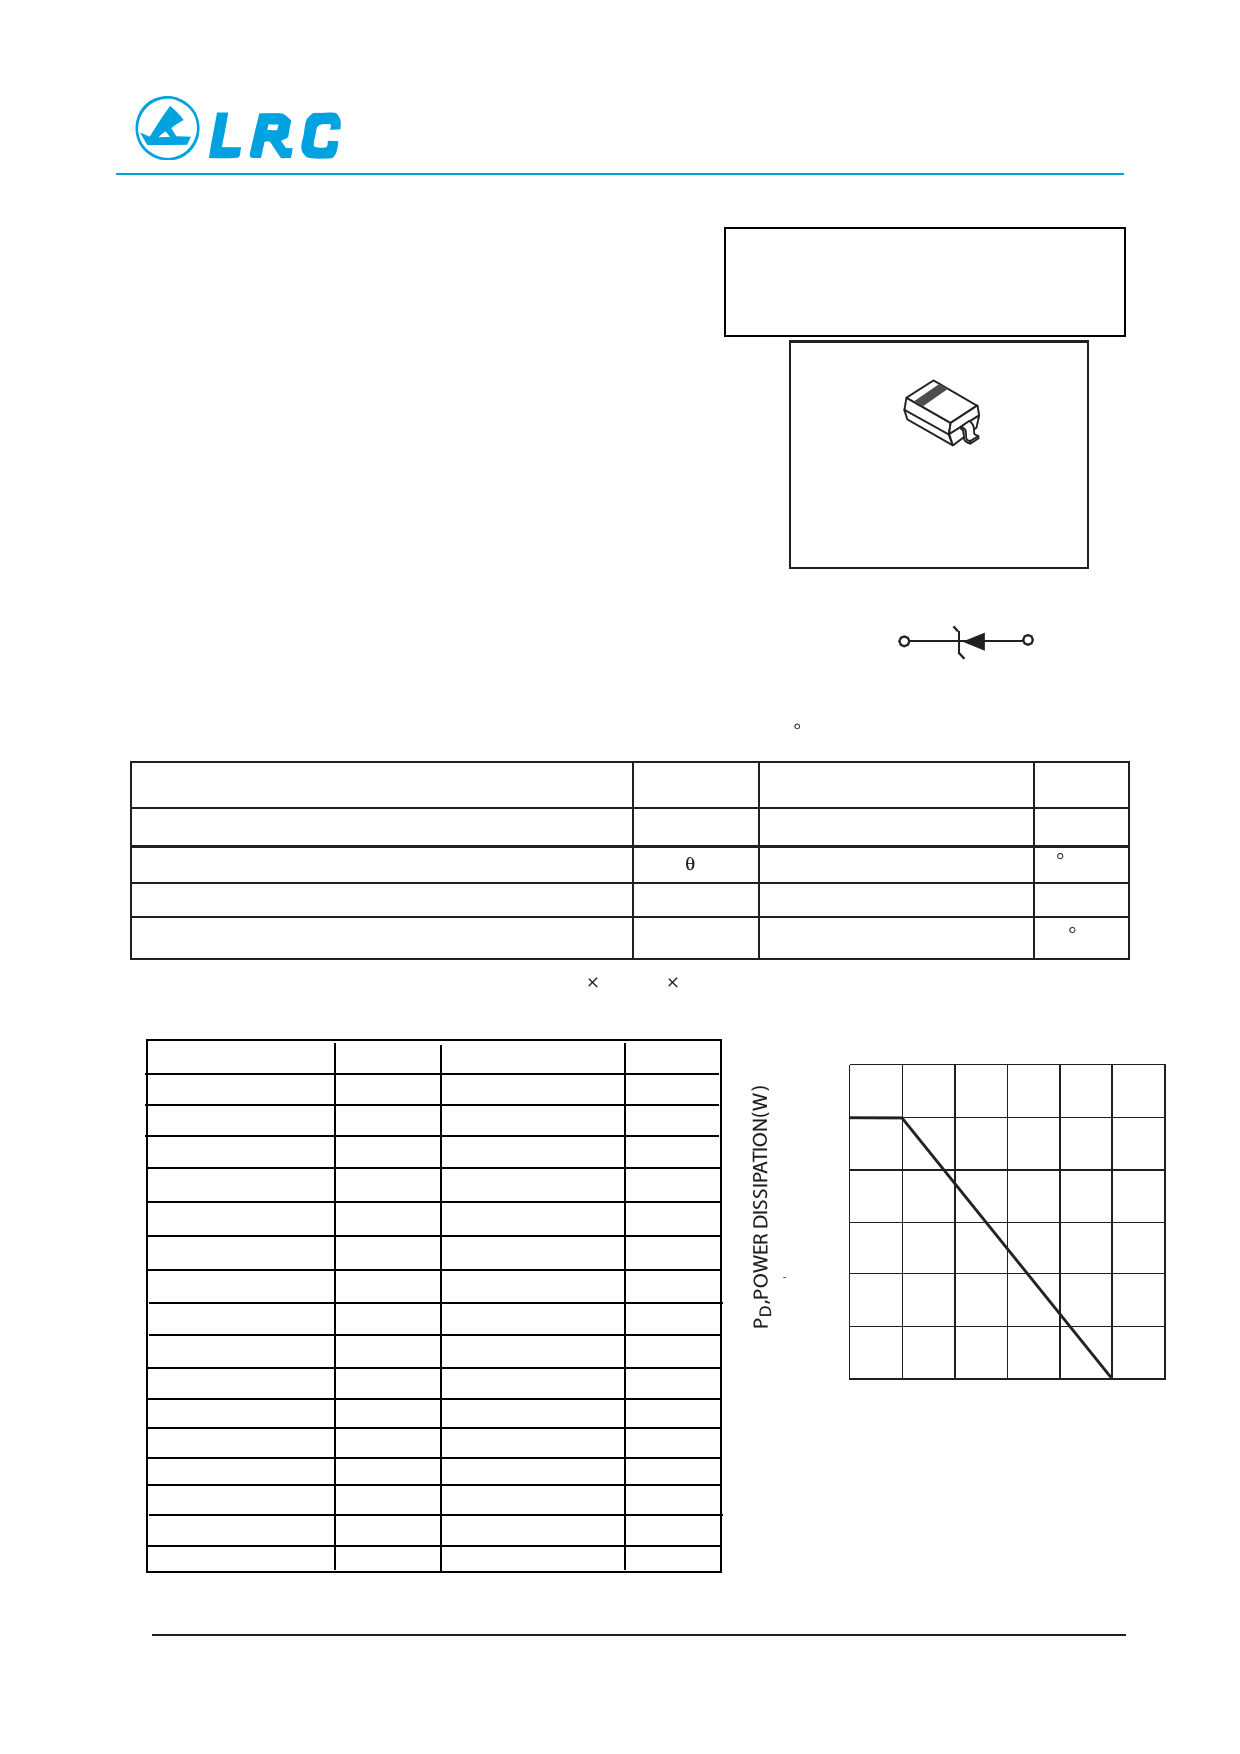 LBZT52B5V1T1G datasheet, circuit